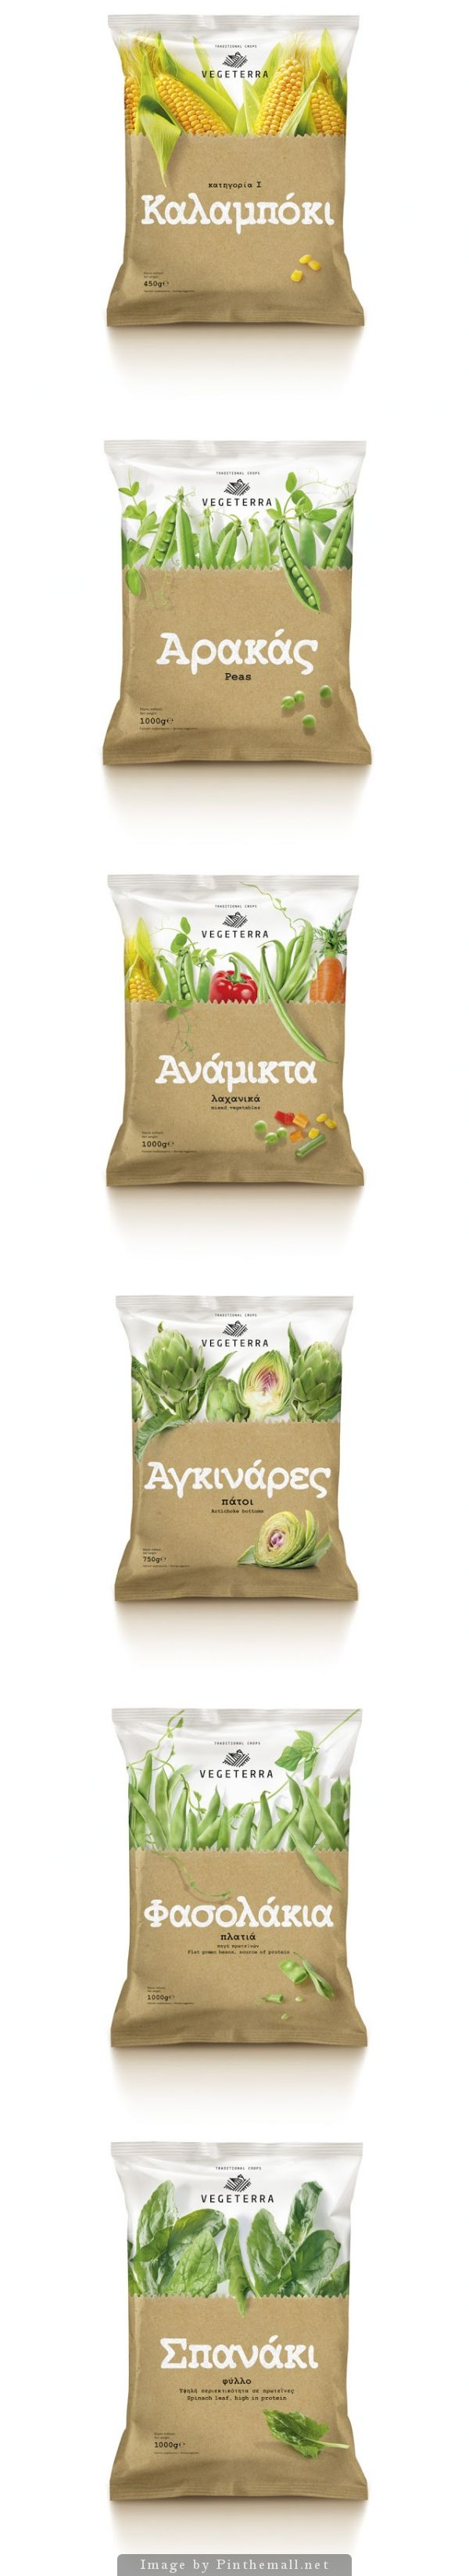 #packaging #design